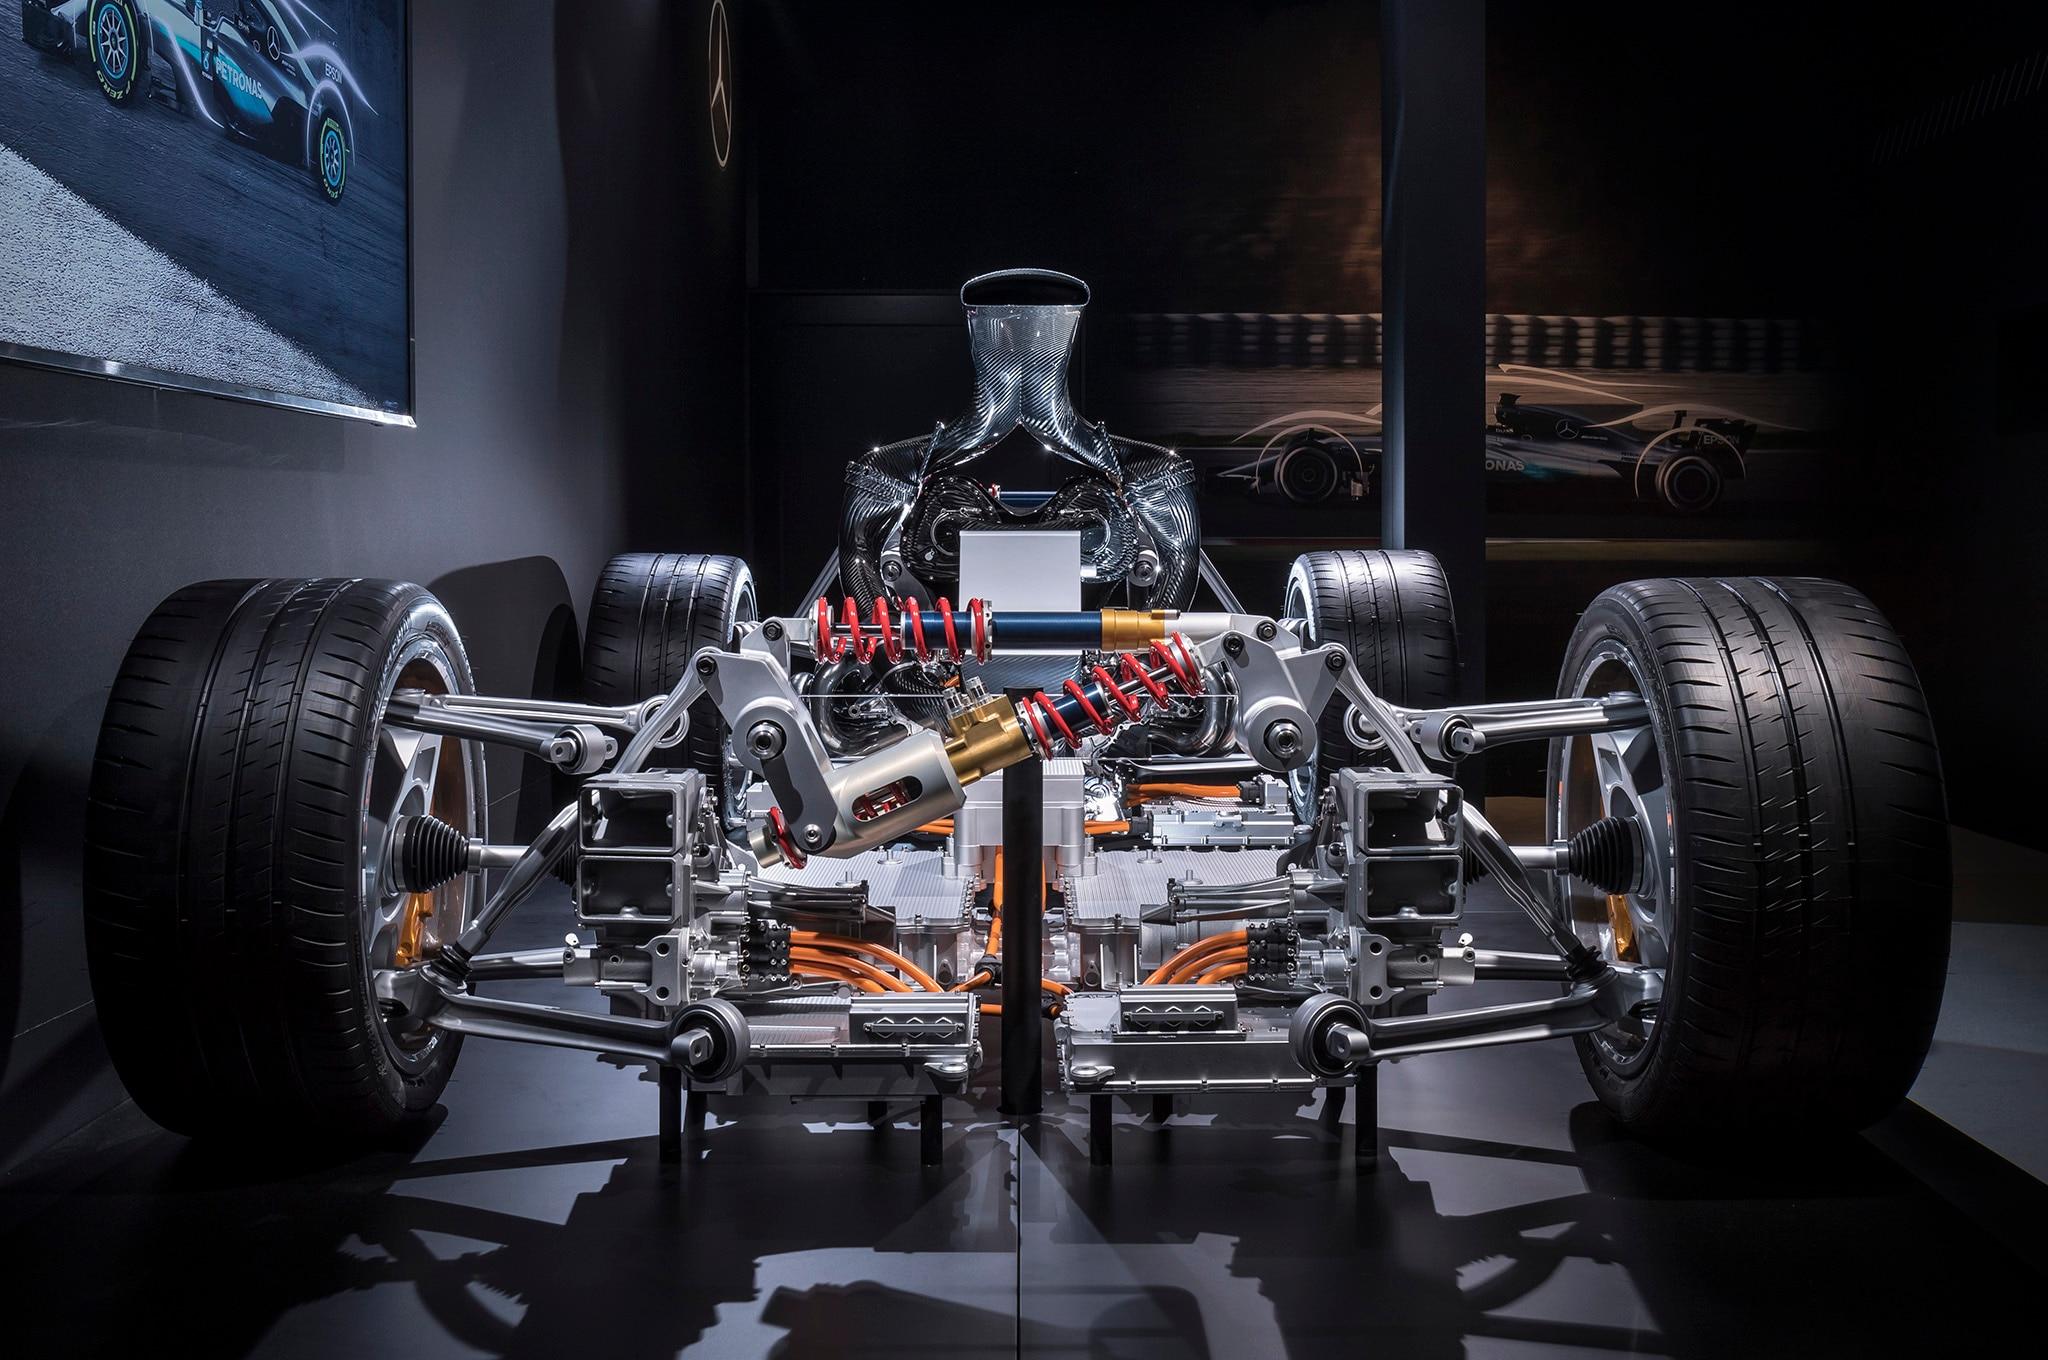 Mercedes amg project one hypercar s powertrain revealed for Mercedes benz amg project one